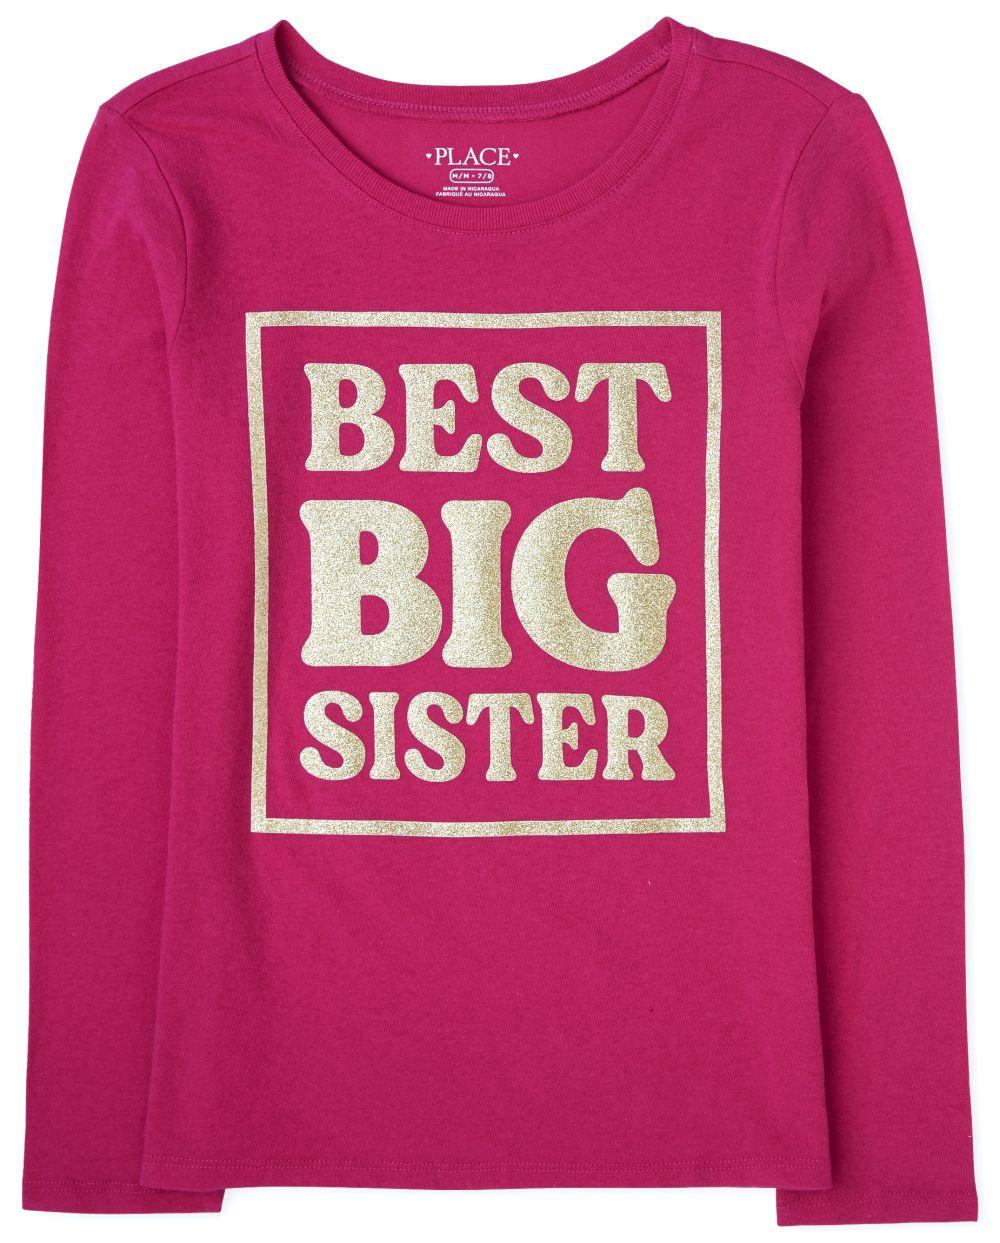 Girls Big Sister Graphic Tee